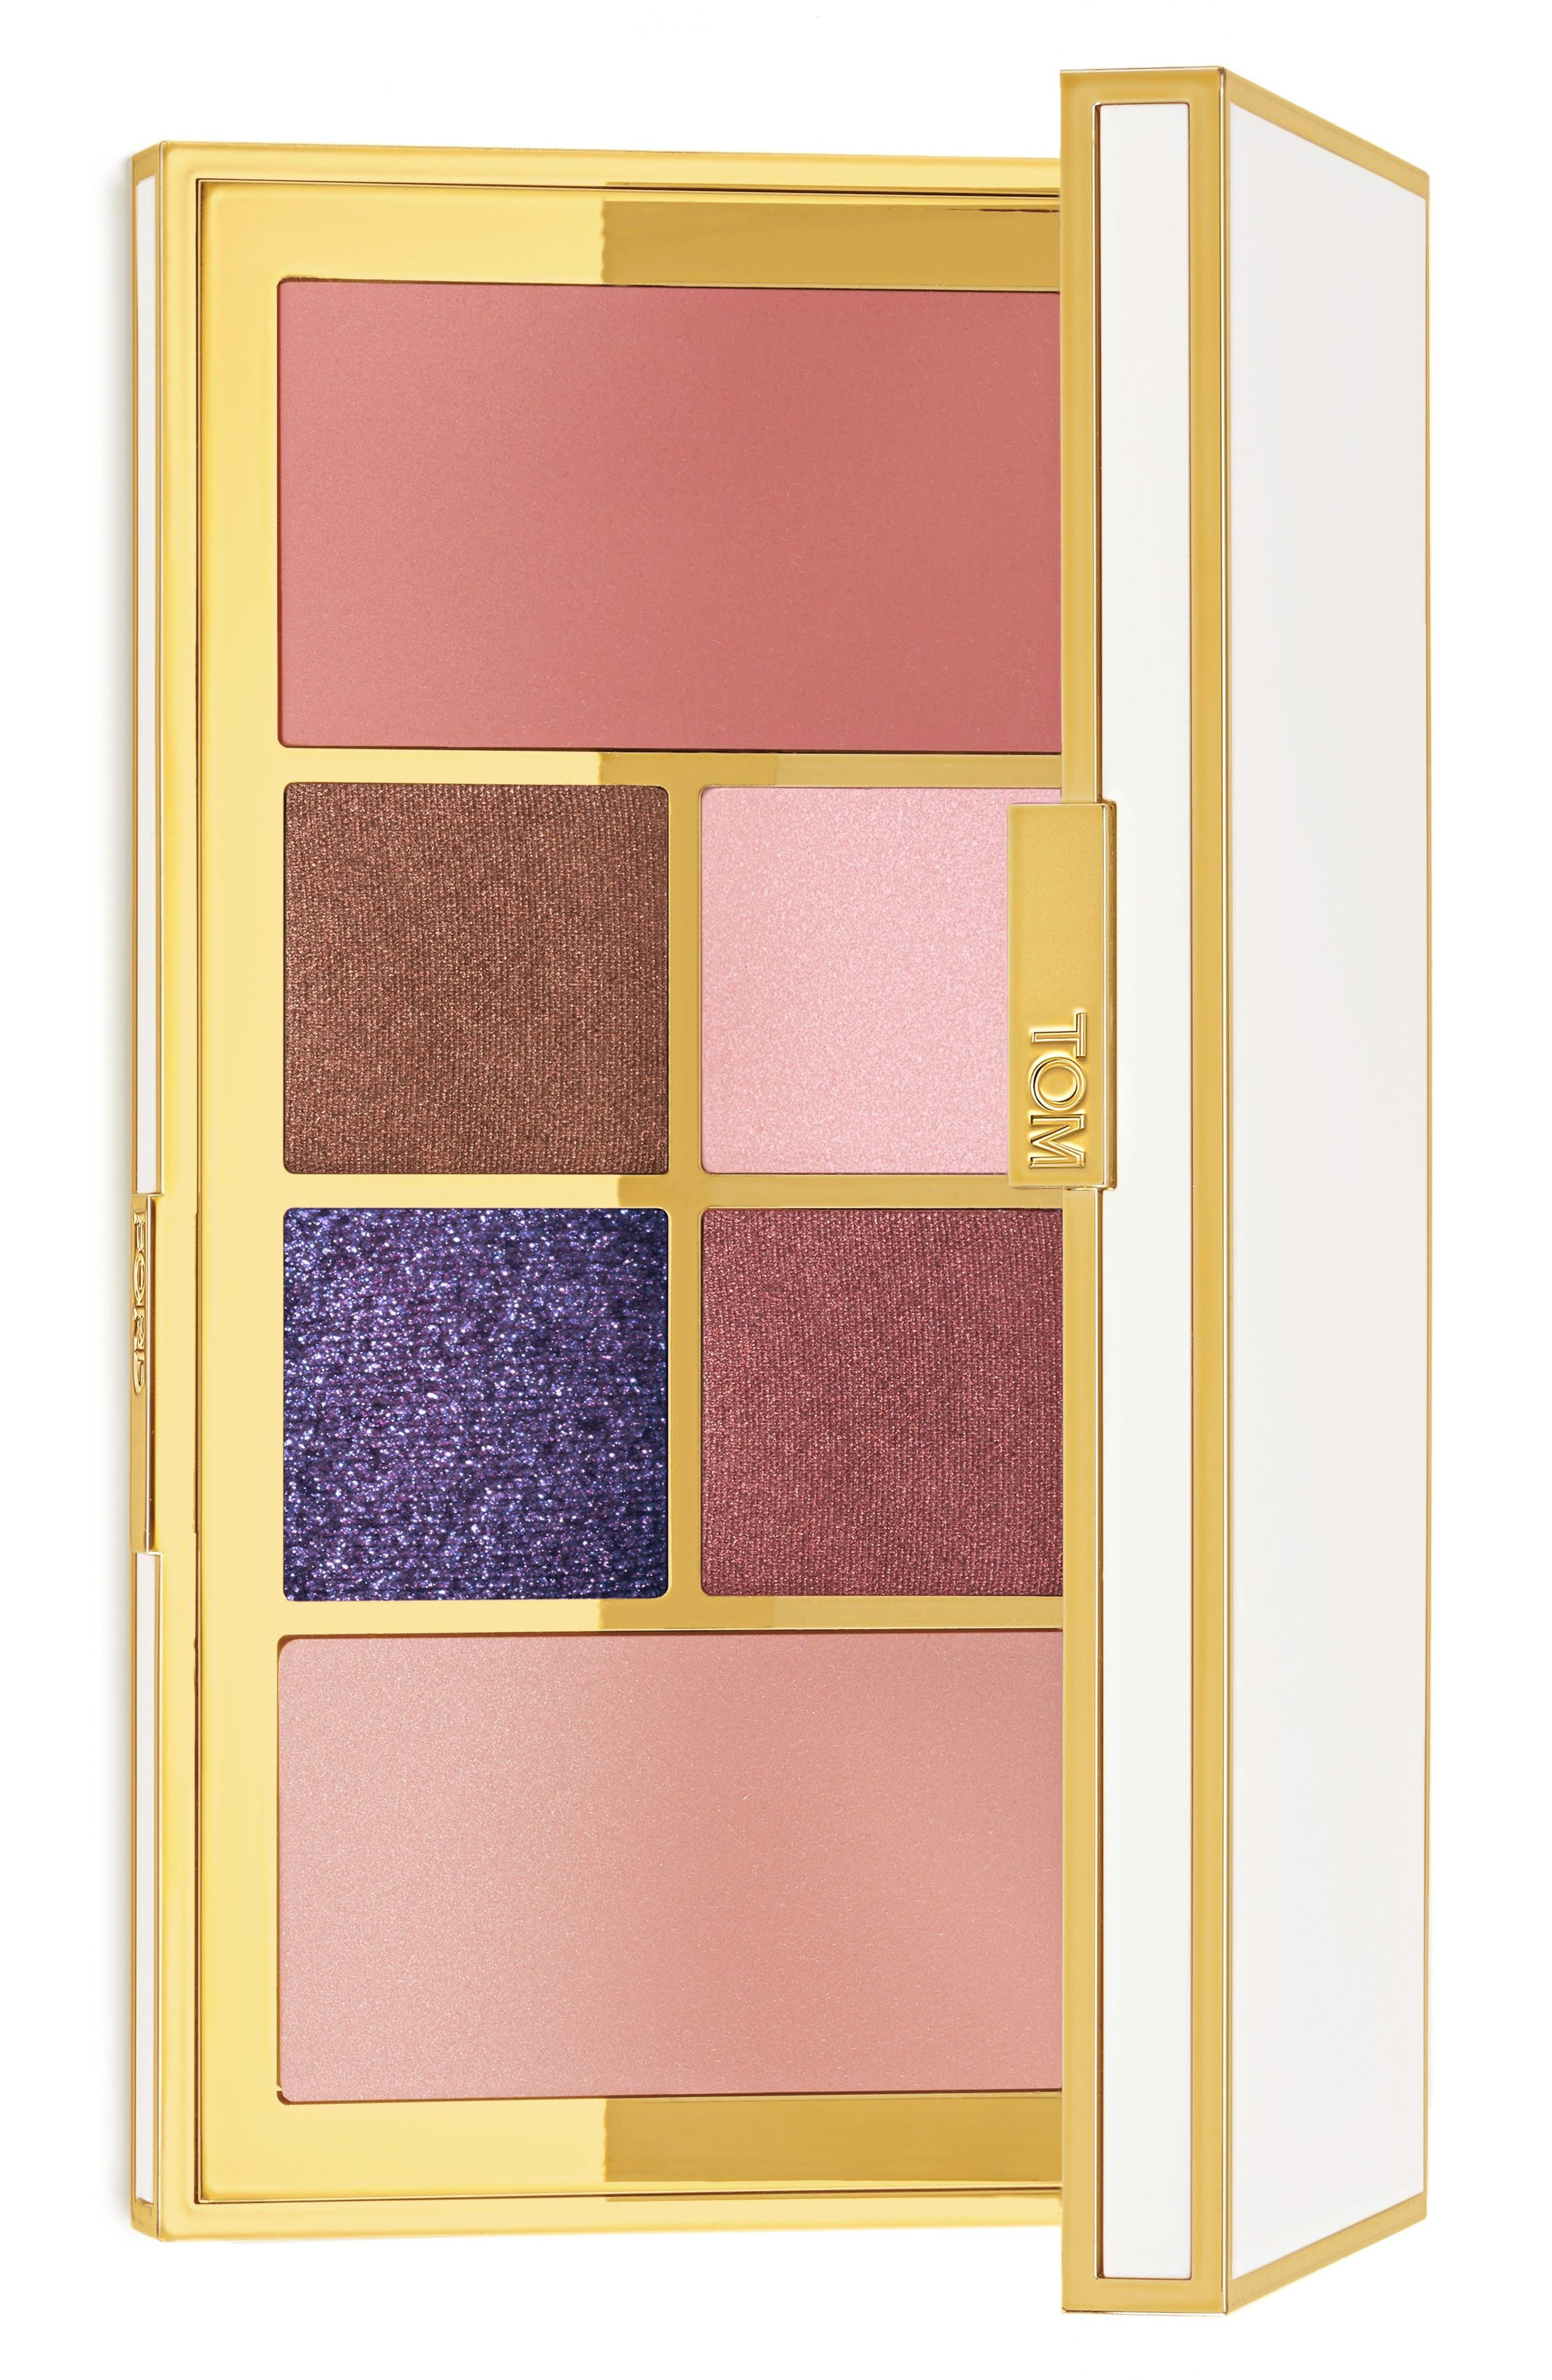 Soleil Eye and Cheek Palette,                         Main,                         color, Violet Argent